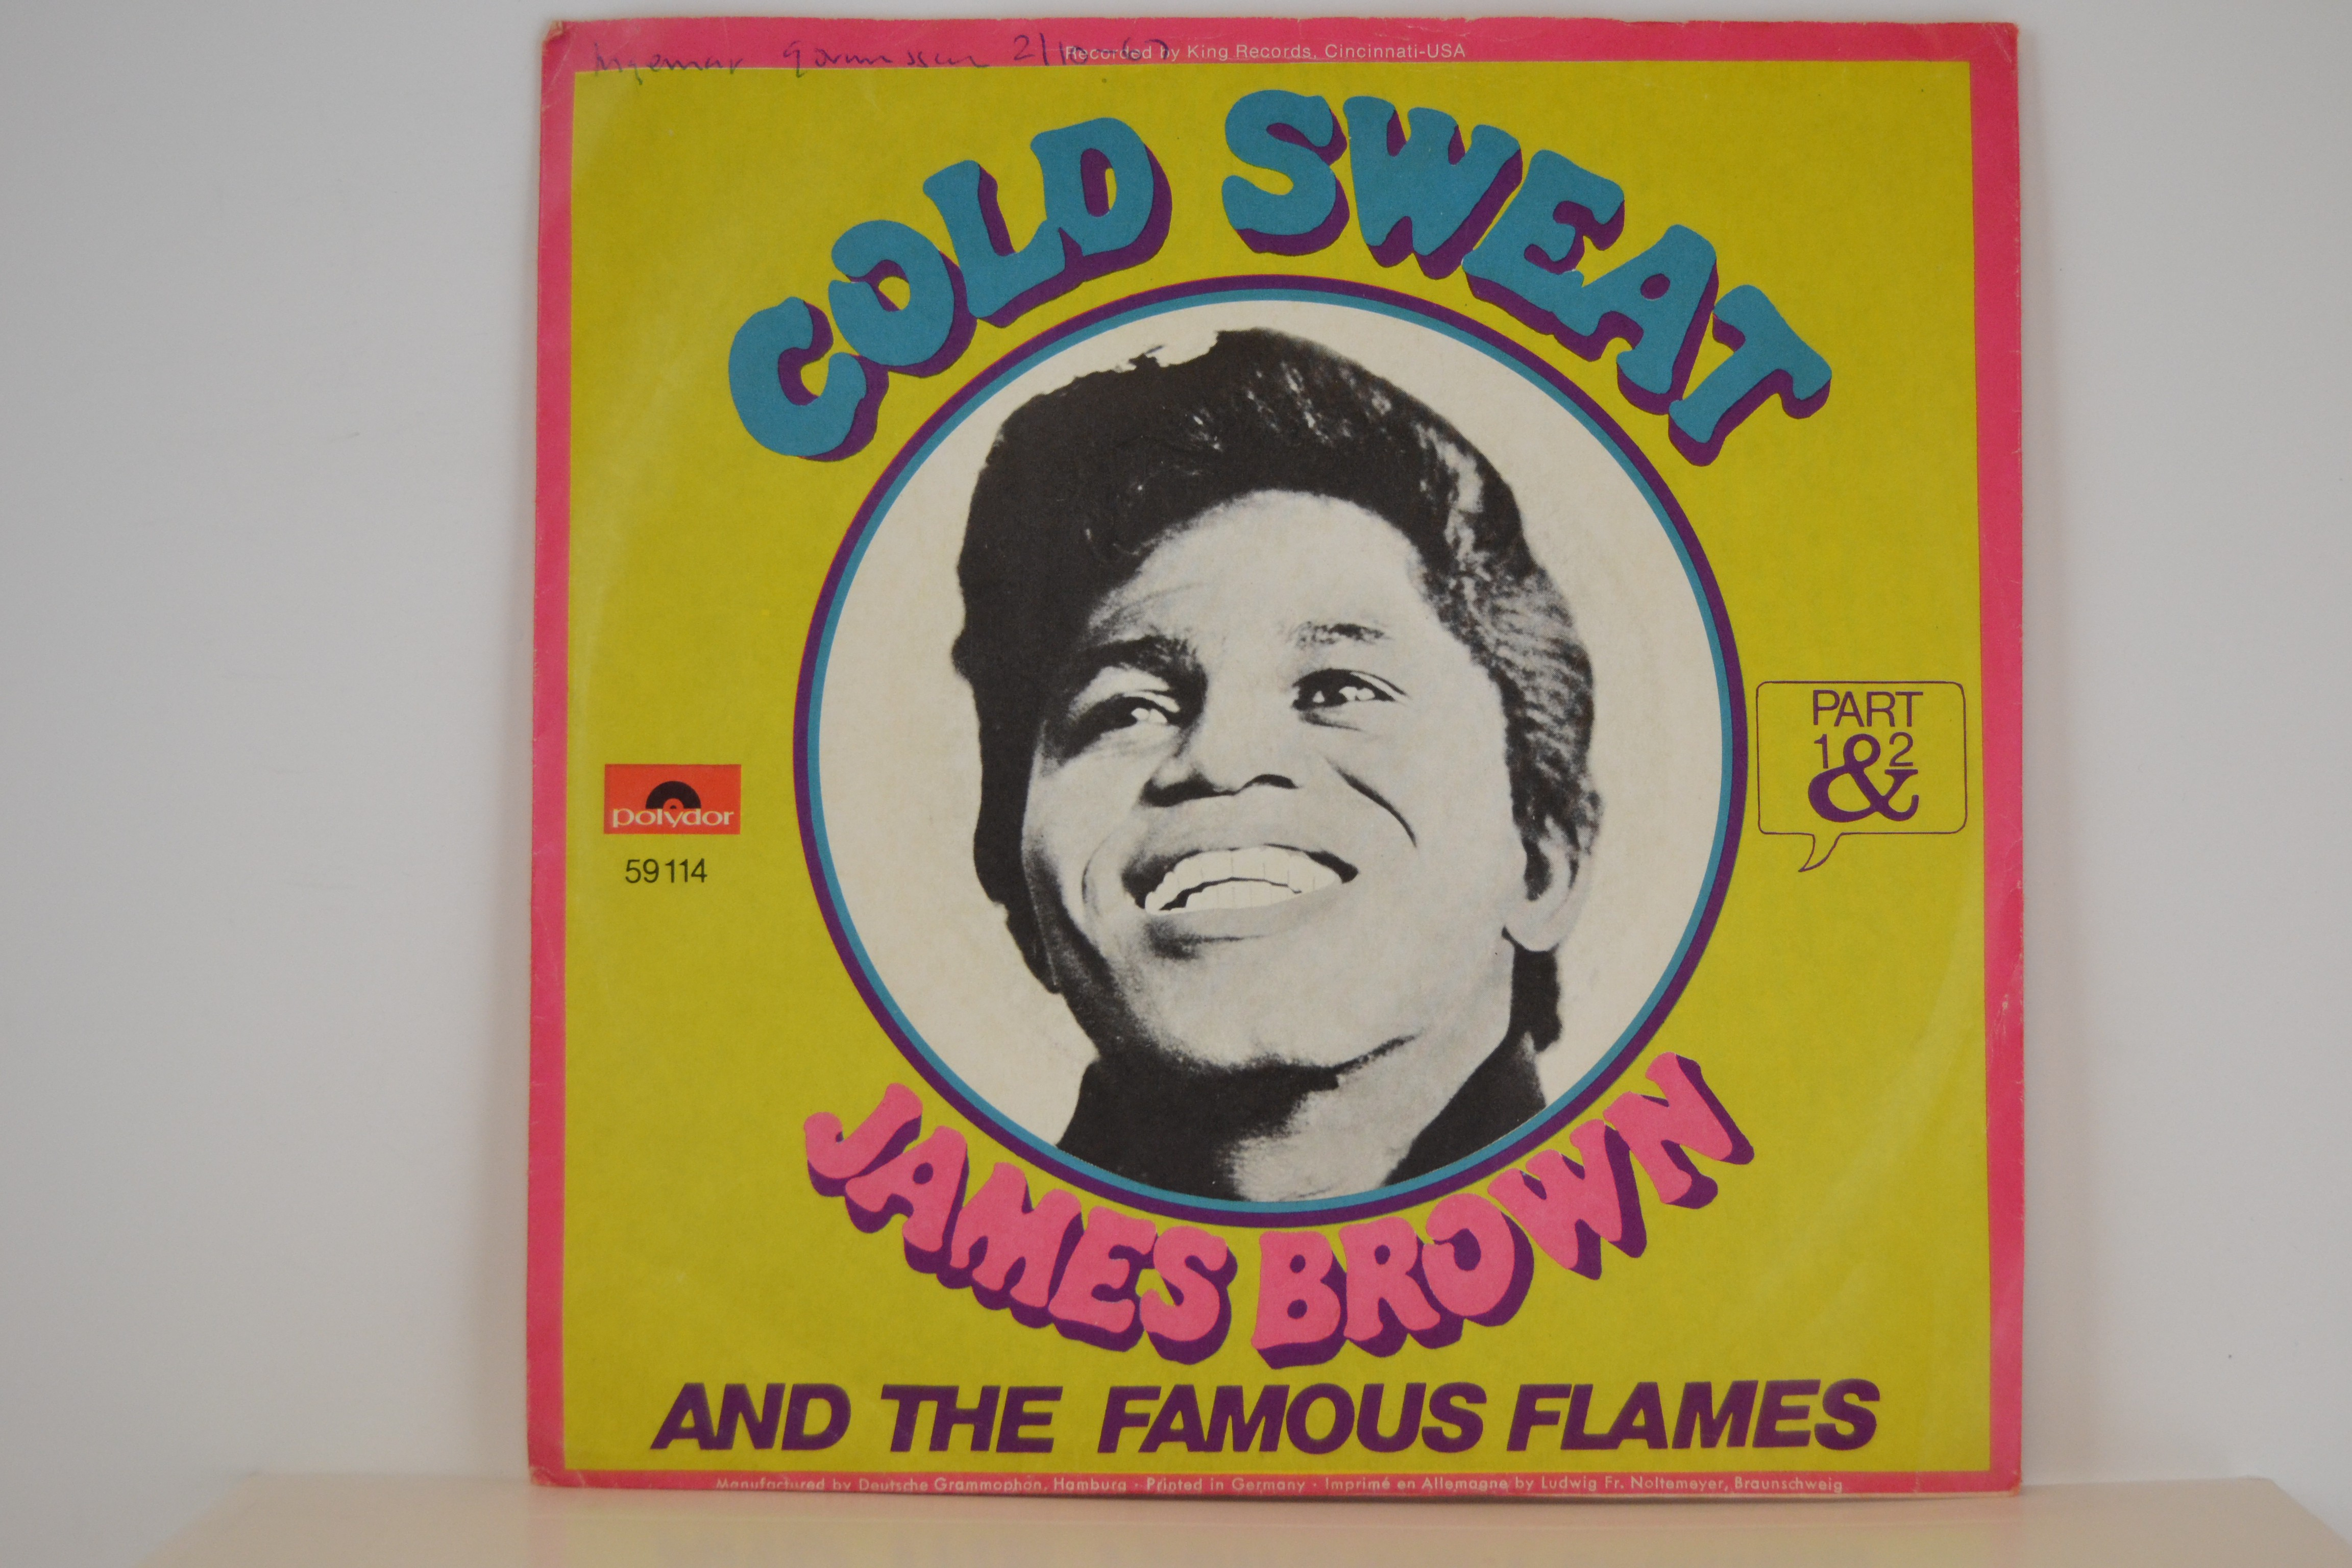 JAMES BROWN : Cold sweat (Part 1) / Cold sweat (Part 2)